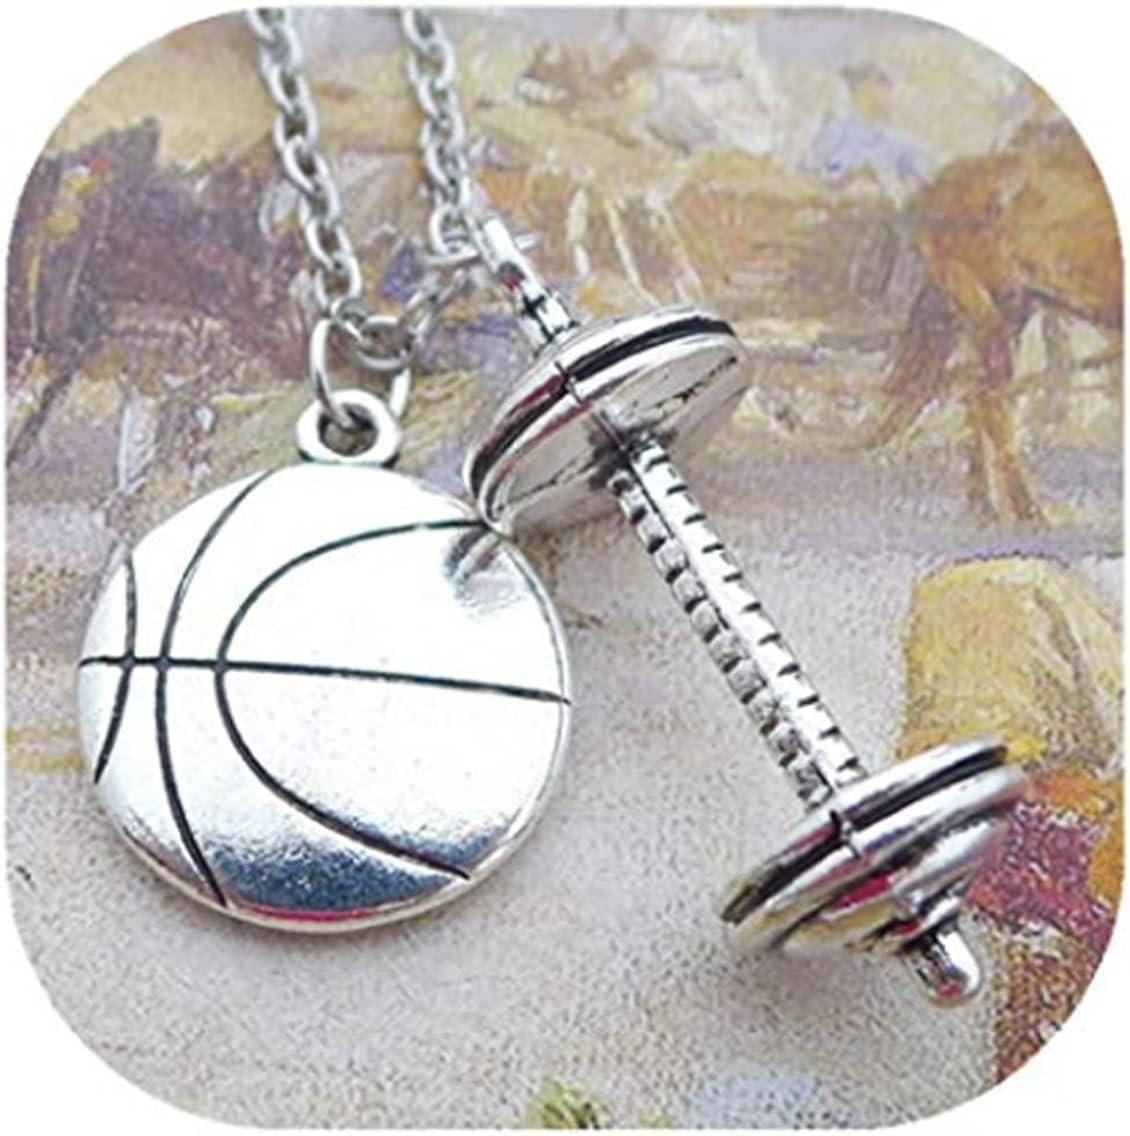 GYKMDF Collar de Fútbol, Collar de Abalorio de Fútbol, Colgante de Mancuerna, Collar de Fitness, Collar de Gimnasio, Regalos Deportivos